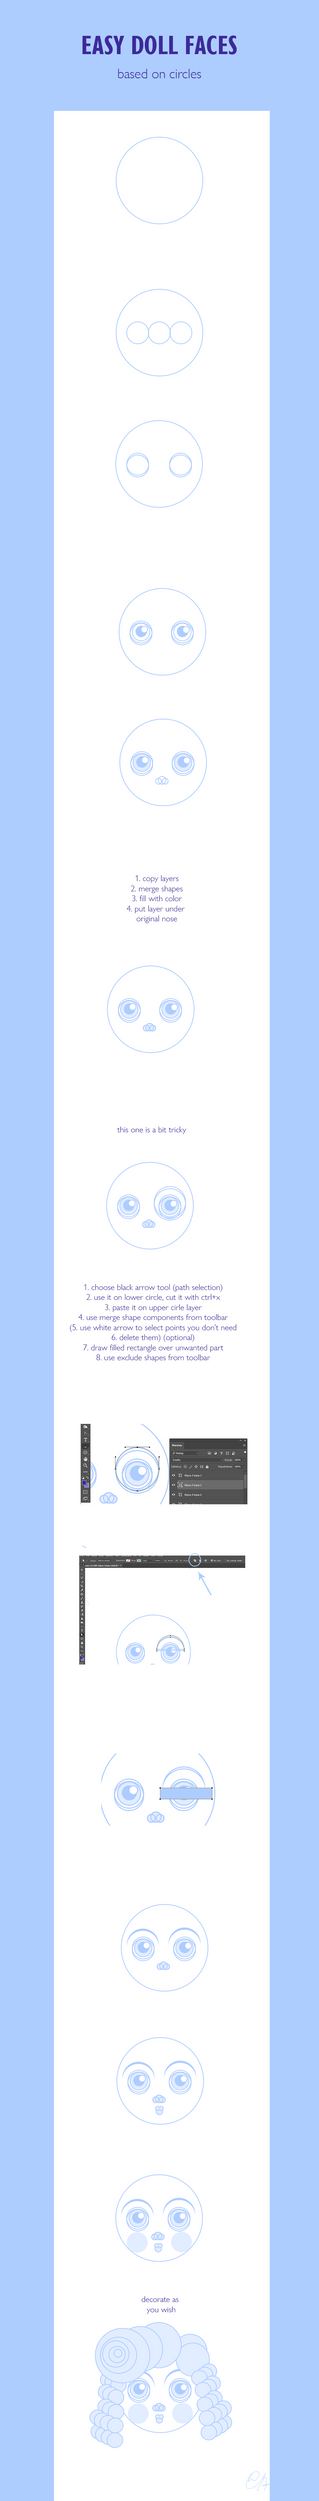 Doll face tutorial by Kinkostfur